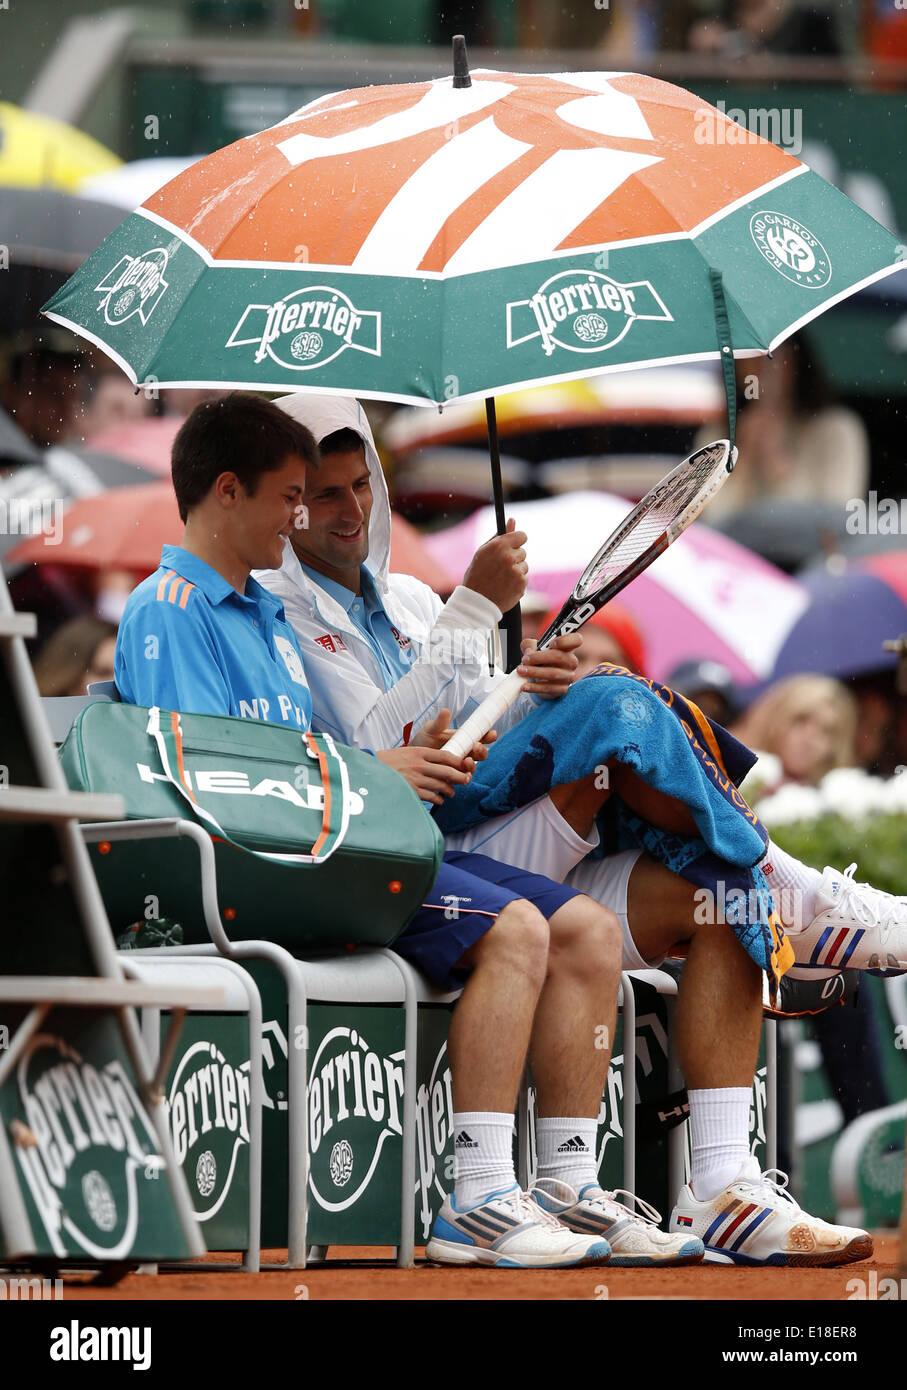 Paris 26th May 2014 Novak Djokovic R Of Serbia Holds The Stock Photo Alamy